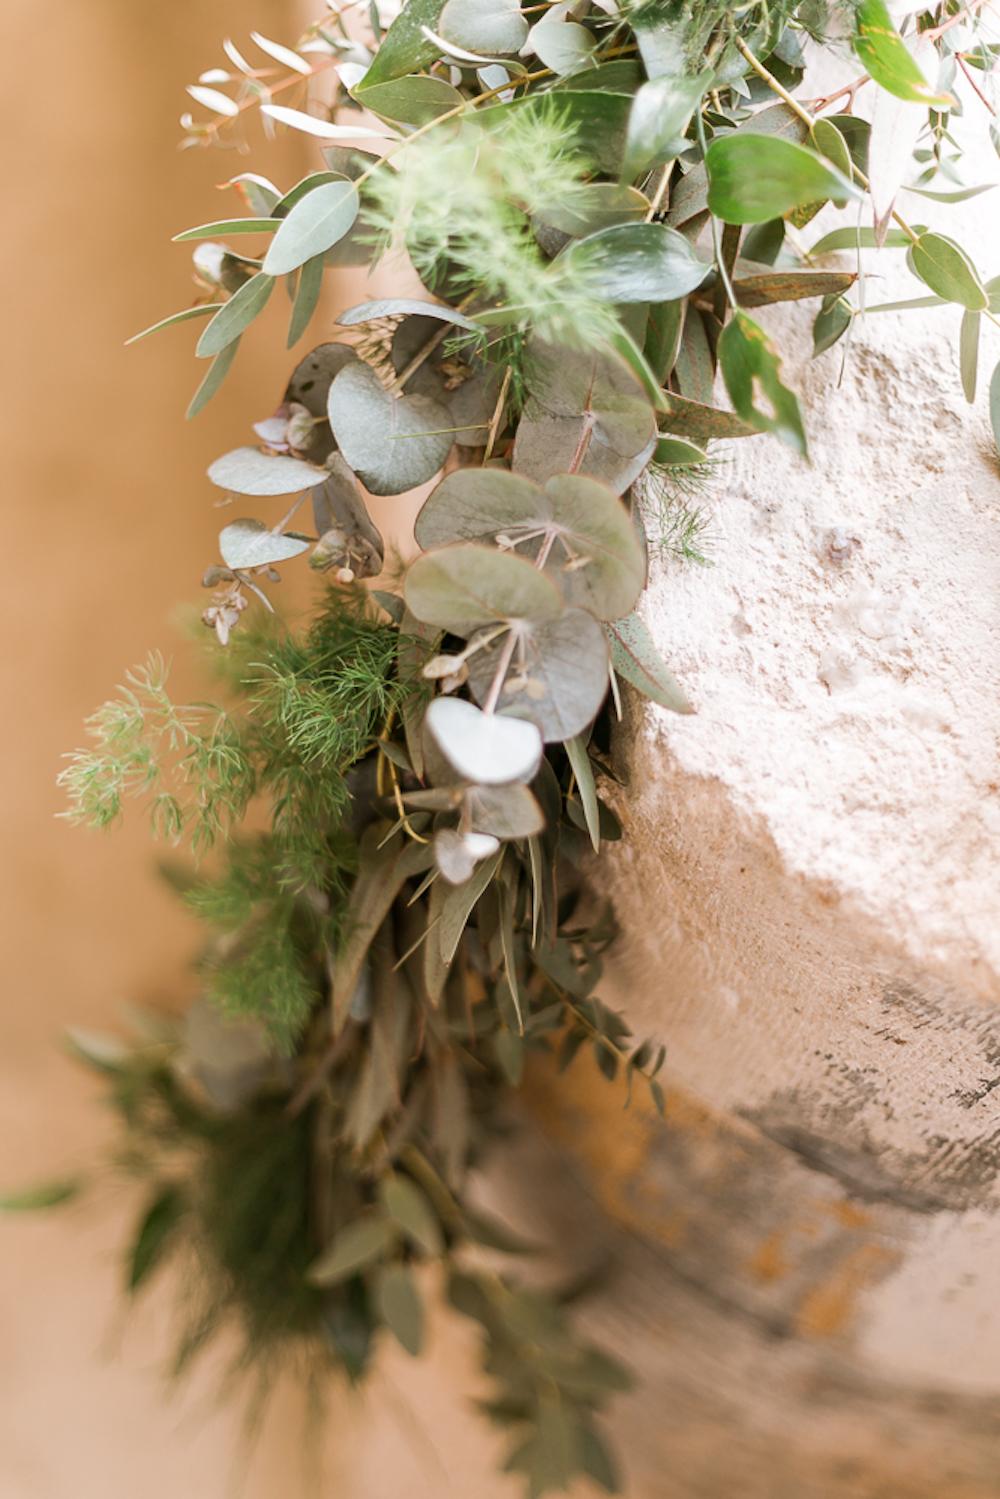 parisian-inspired-blog-mariage-shooting-inspiration-vegetal-abbaye-trois-fontaines-marne-cg-photographie-13.jpg